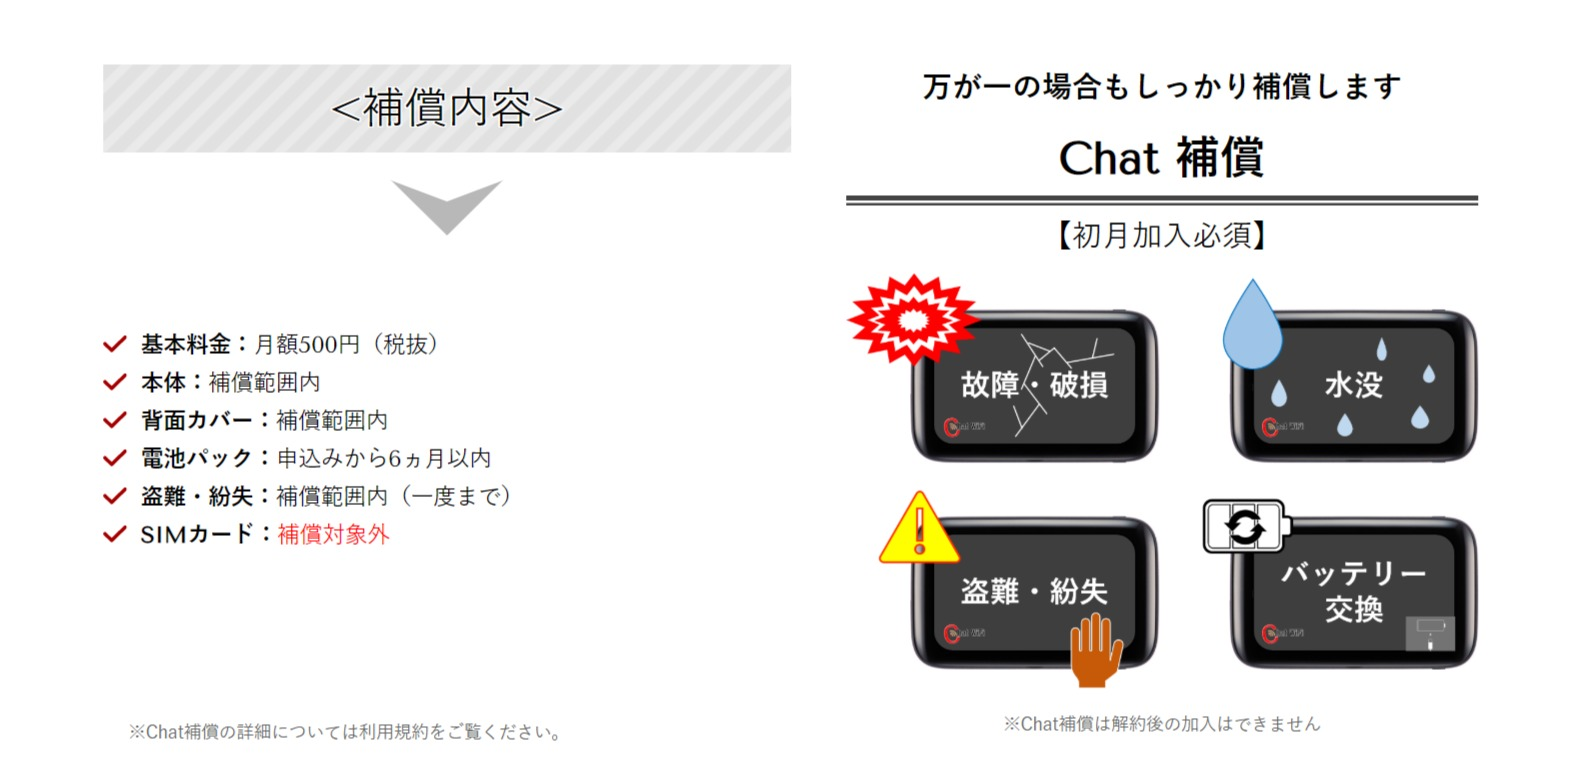 Chat 補償